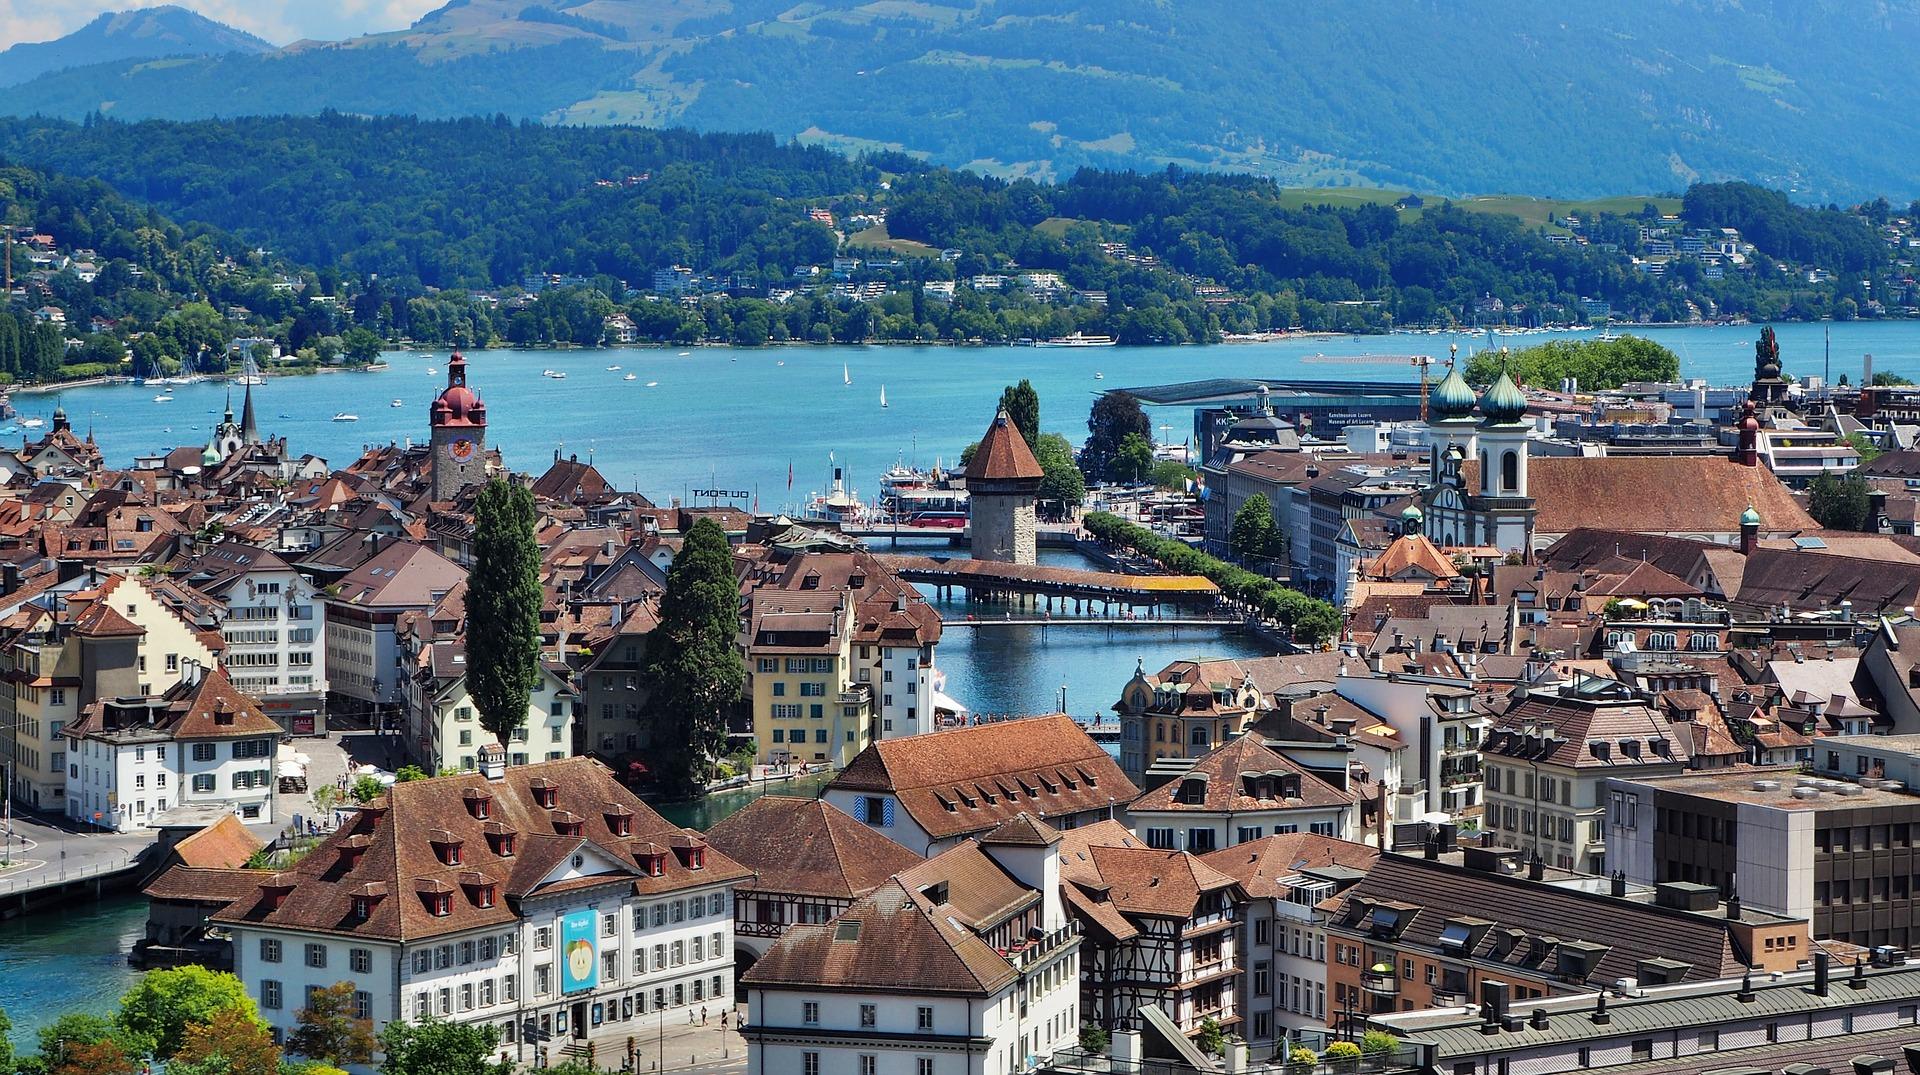 Administrative Belastung – Wo drückt der Schuh bei Luzerner KMU?